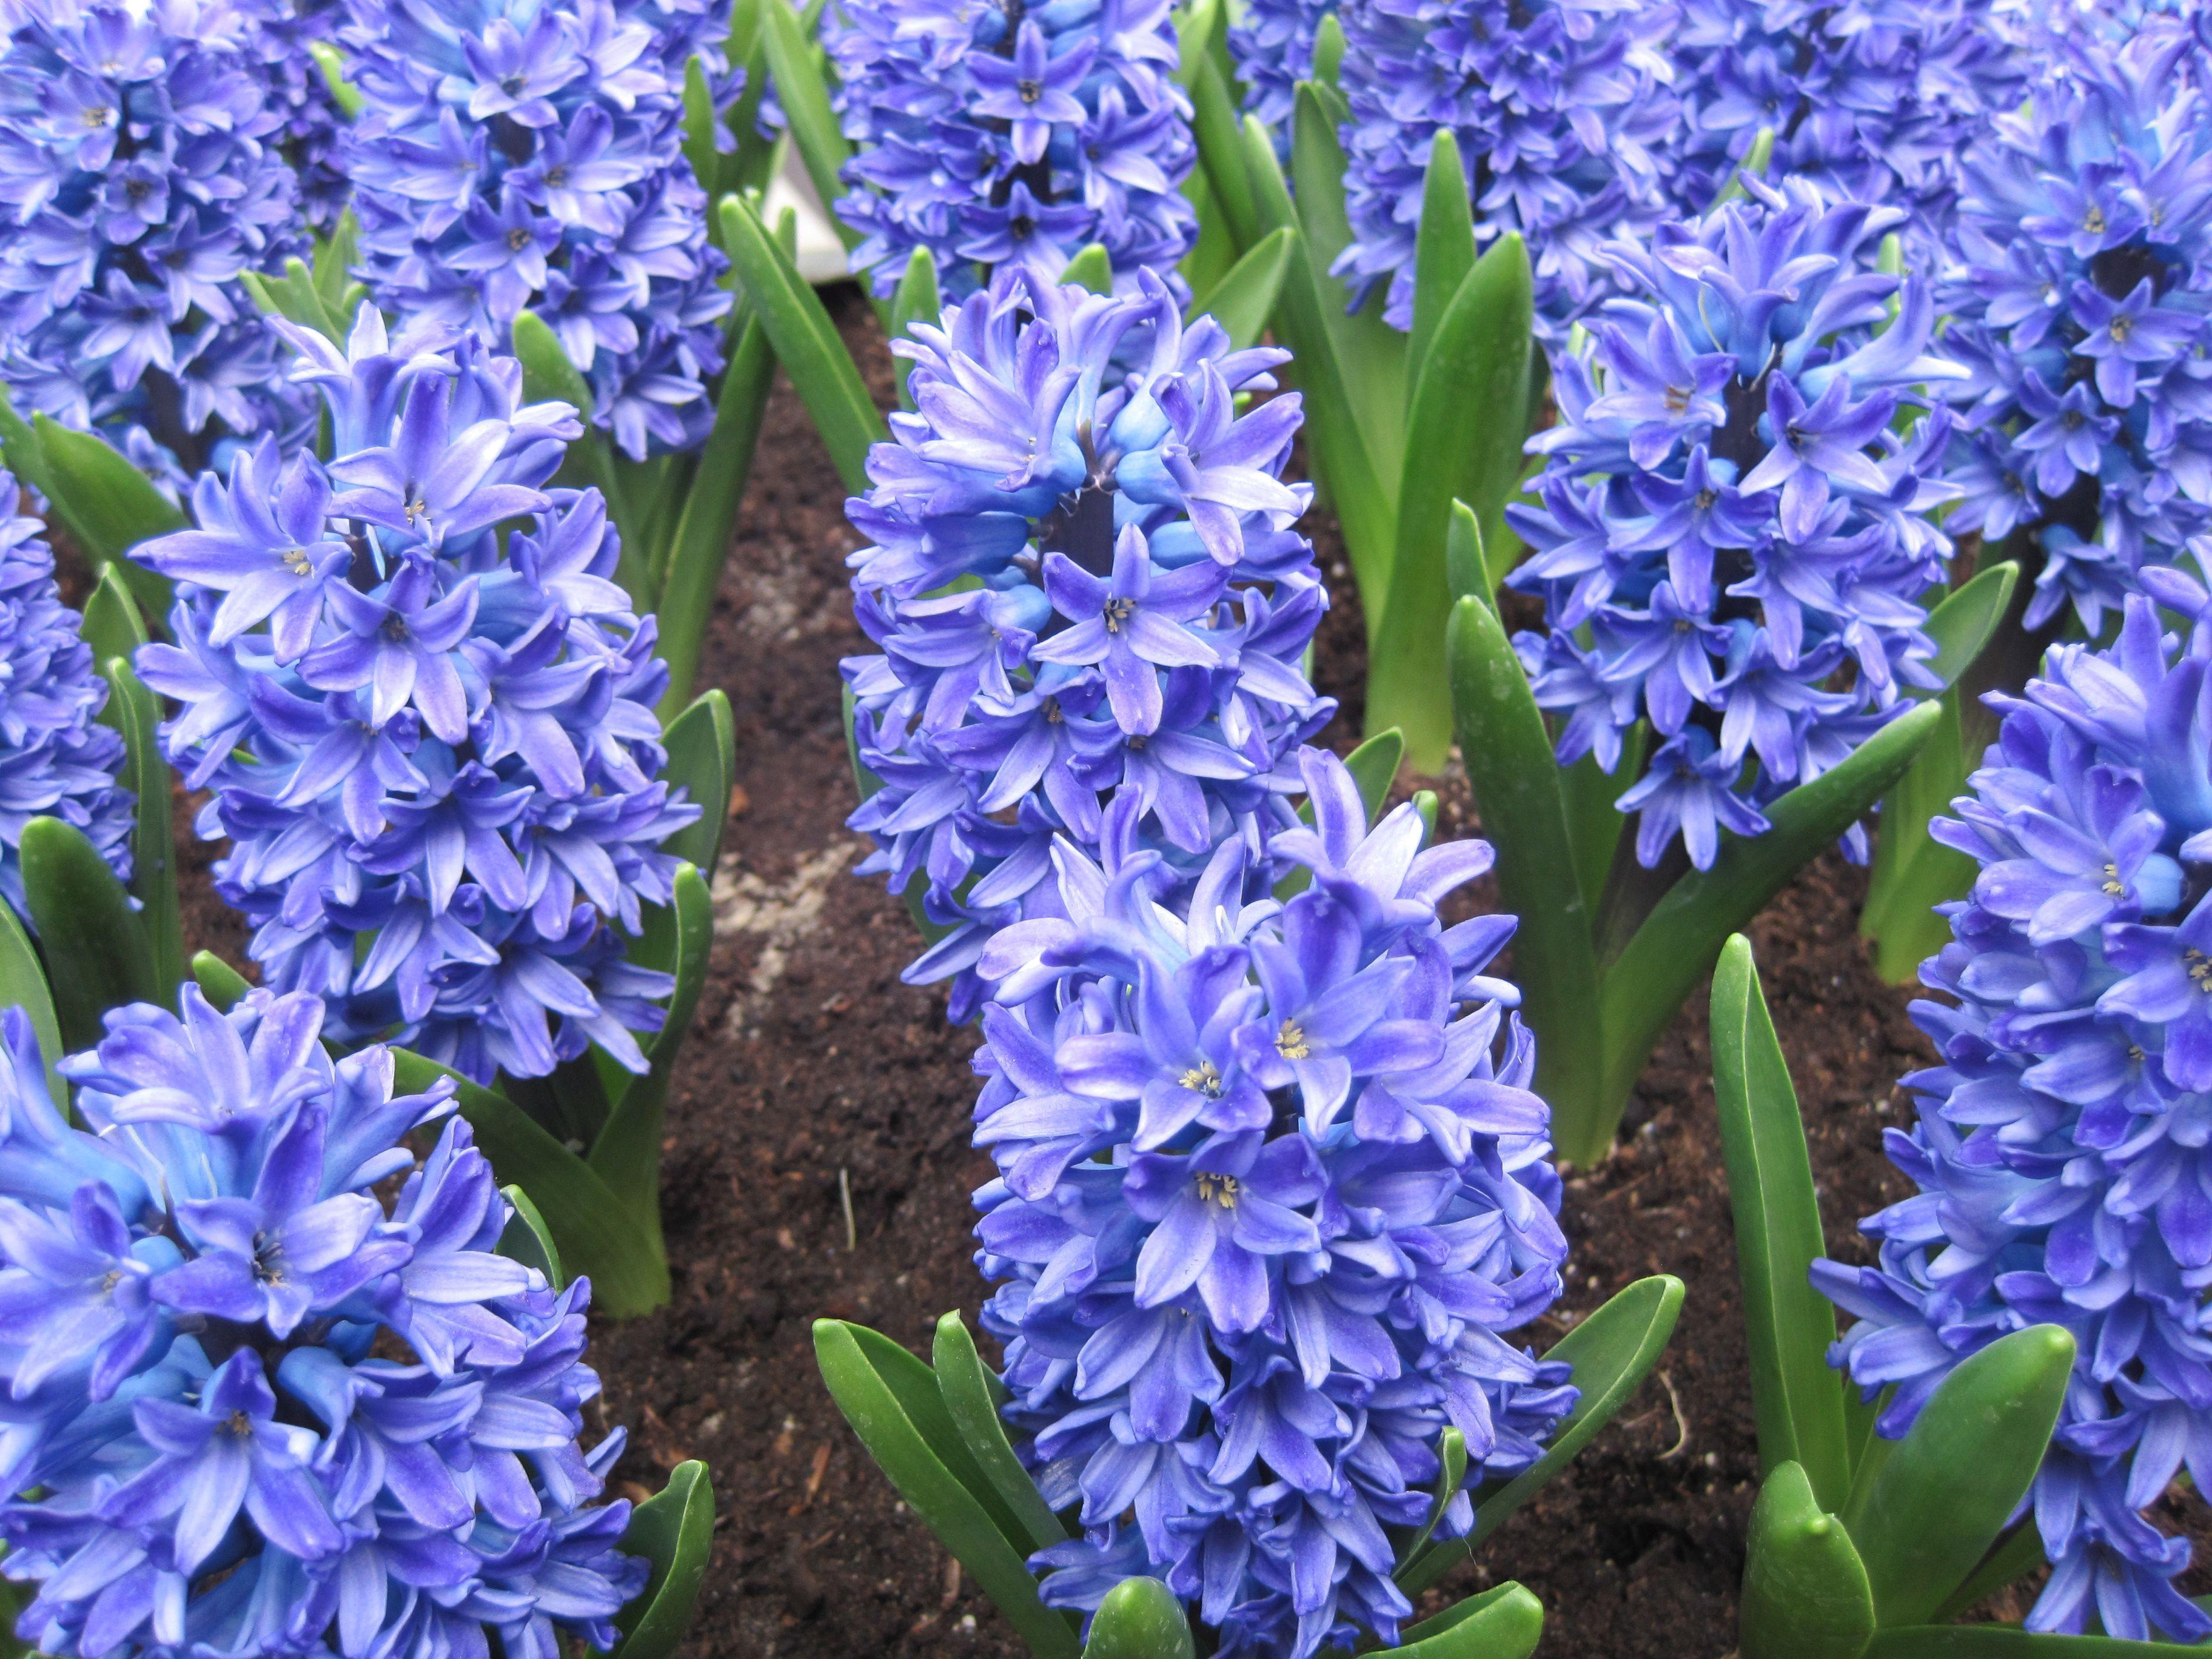 Hyacinths at the Keukenhof The Netherlands